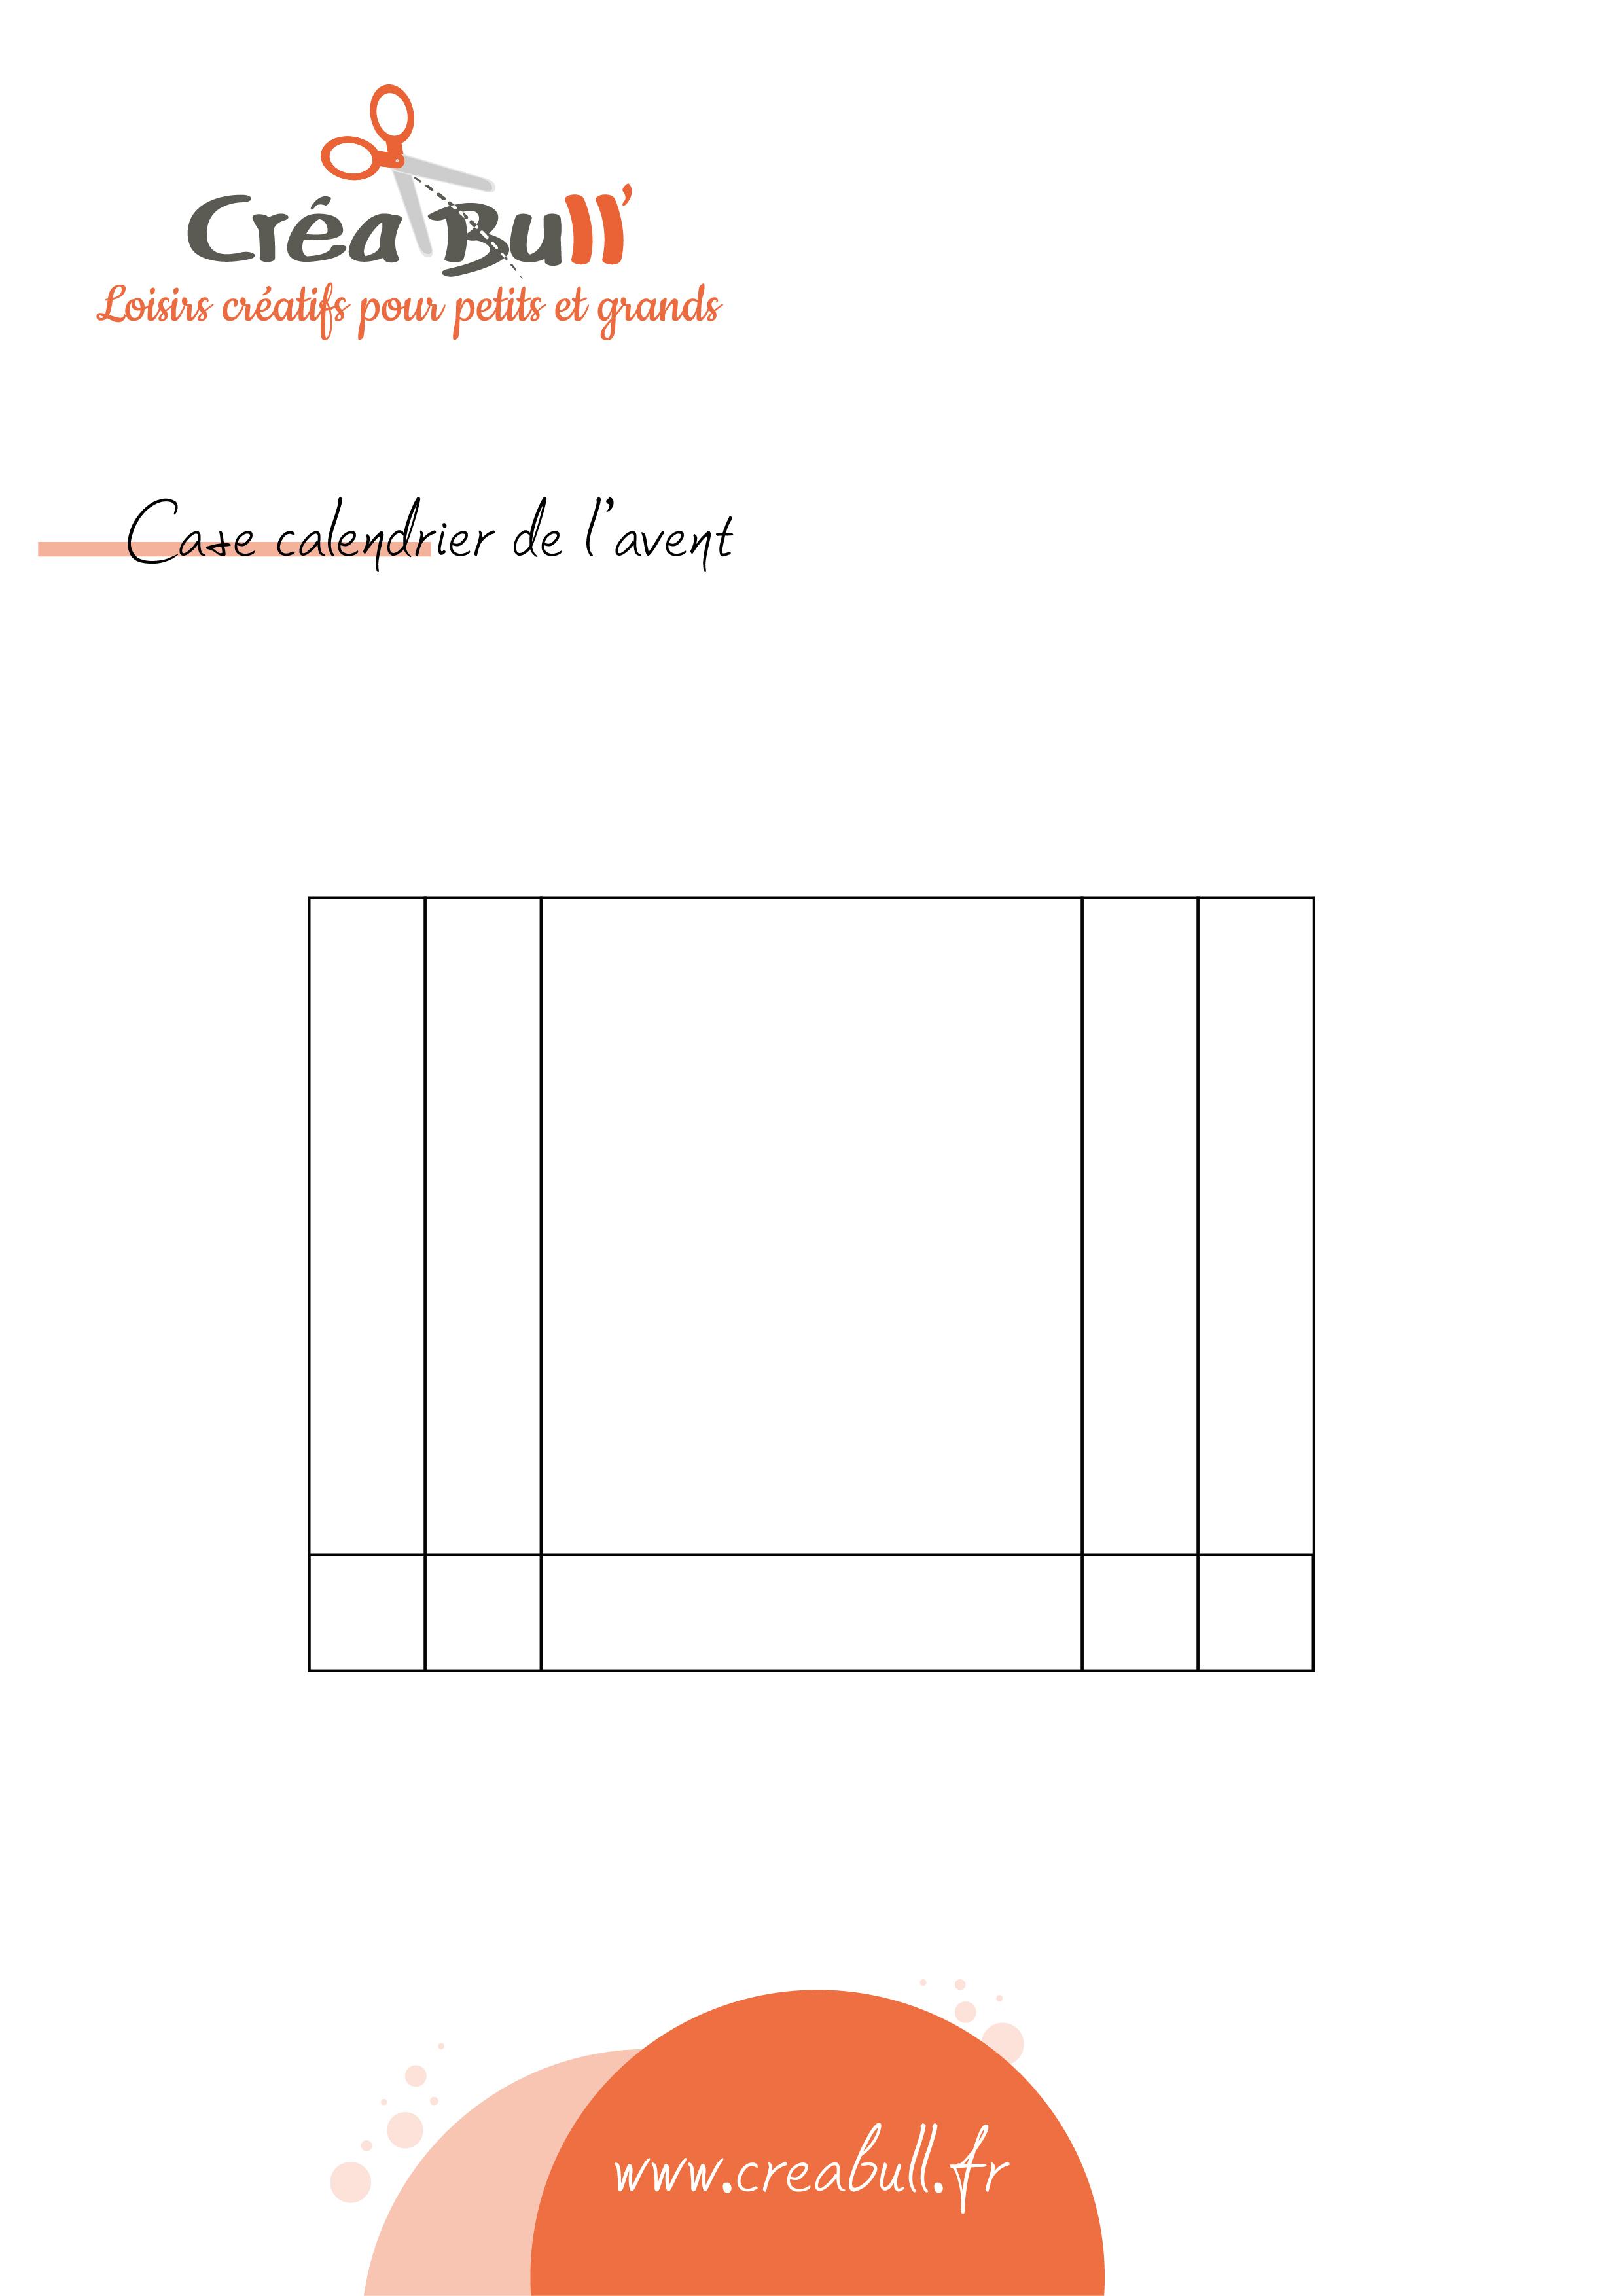 CreaBull_calendrier_avent_2015-01